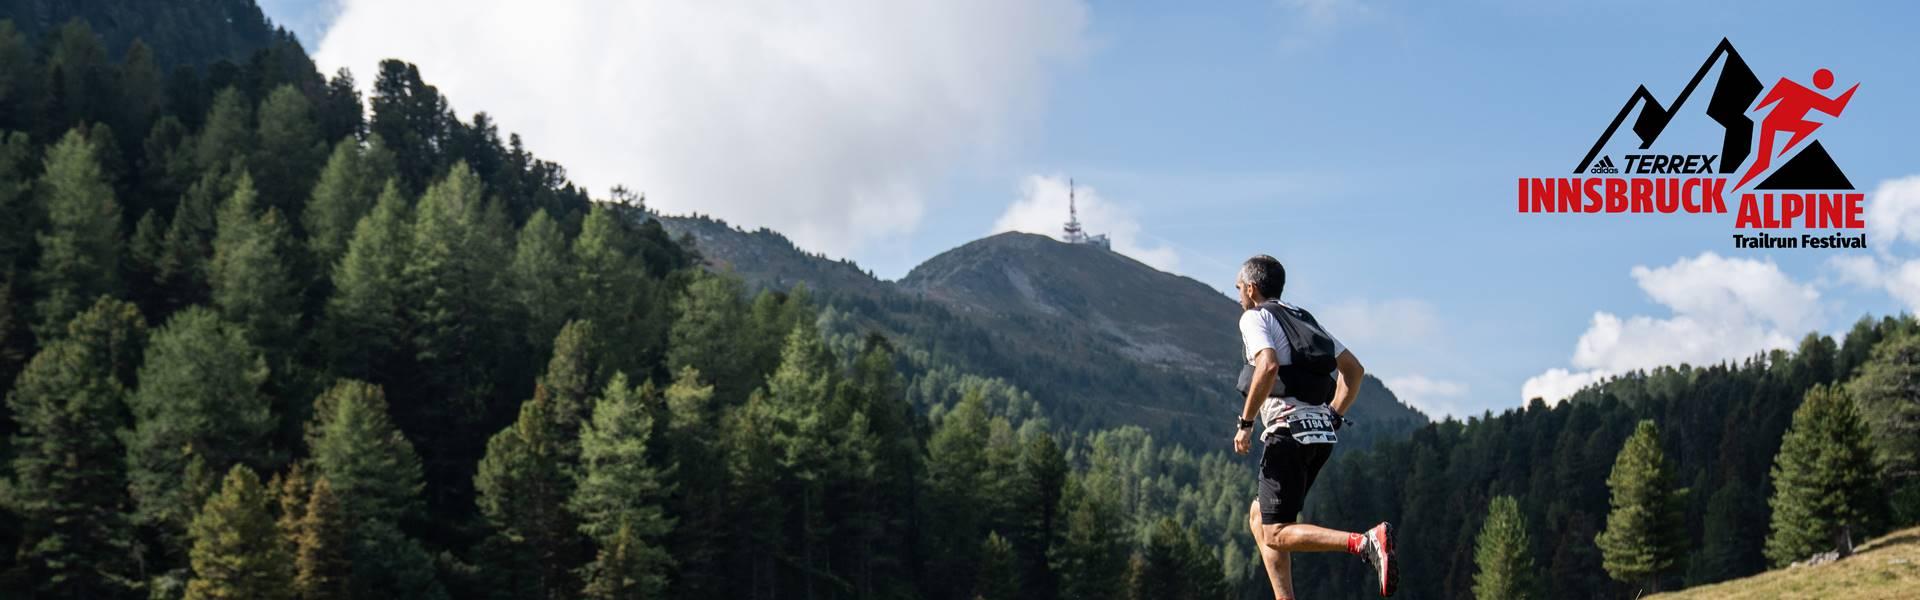 Innsbruck Alpine Trailrun Festival 2021